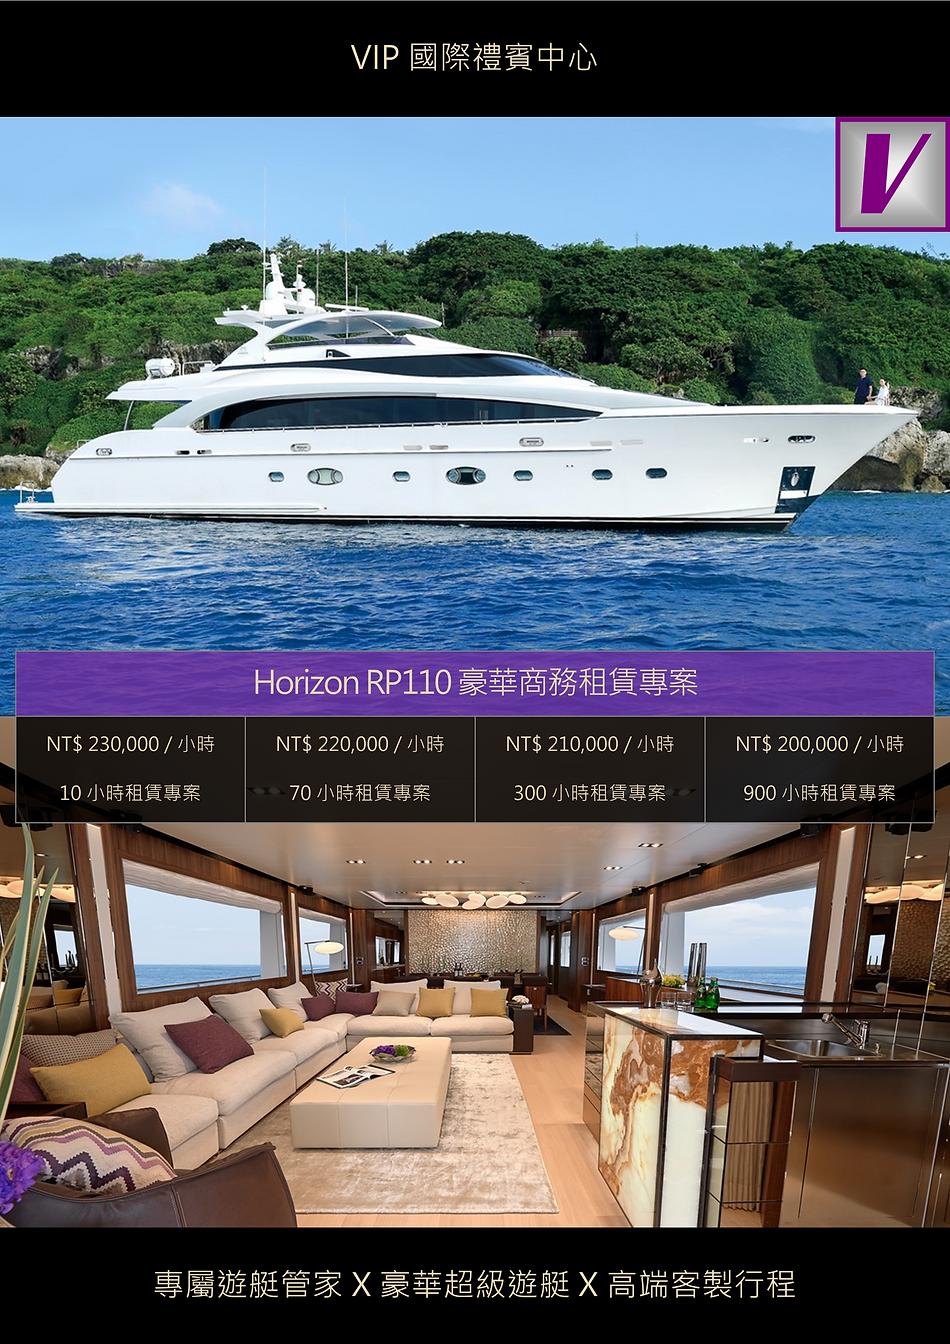 VIP國際禮賓中心 HORIZON RP110 豪華商務租賃專案 DM.png